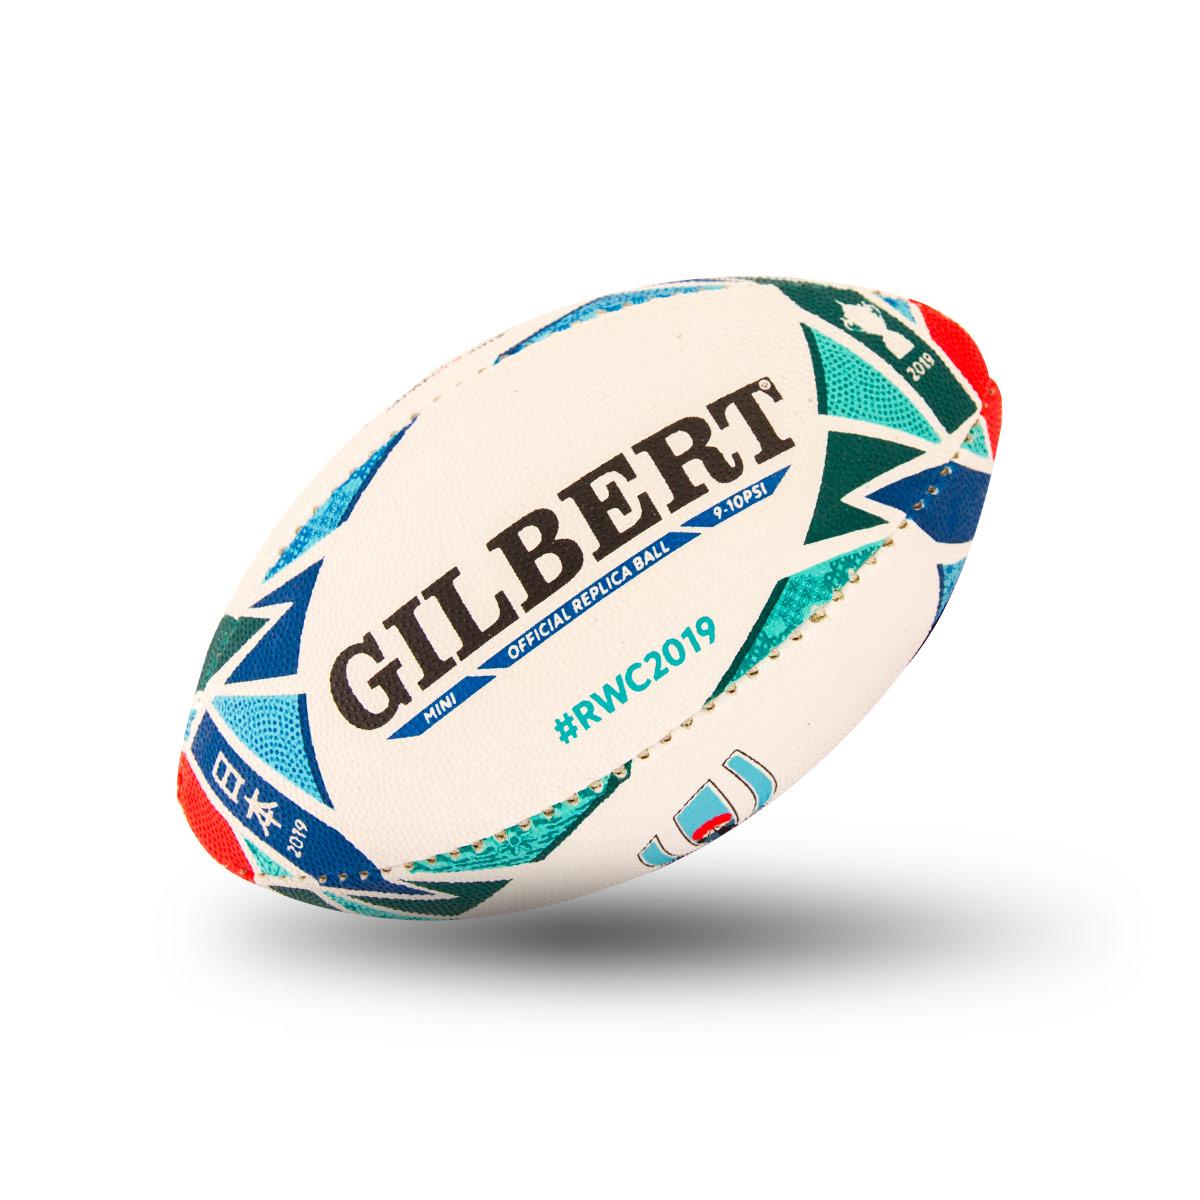 146db4e3f26dd4 Gilbert Rugby World Cup 2019 Replica Mini Rugby Ball | rugbystore